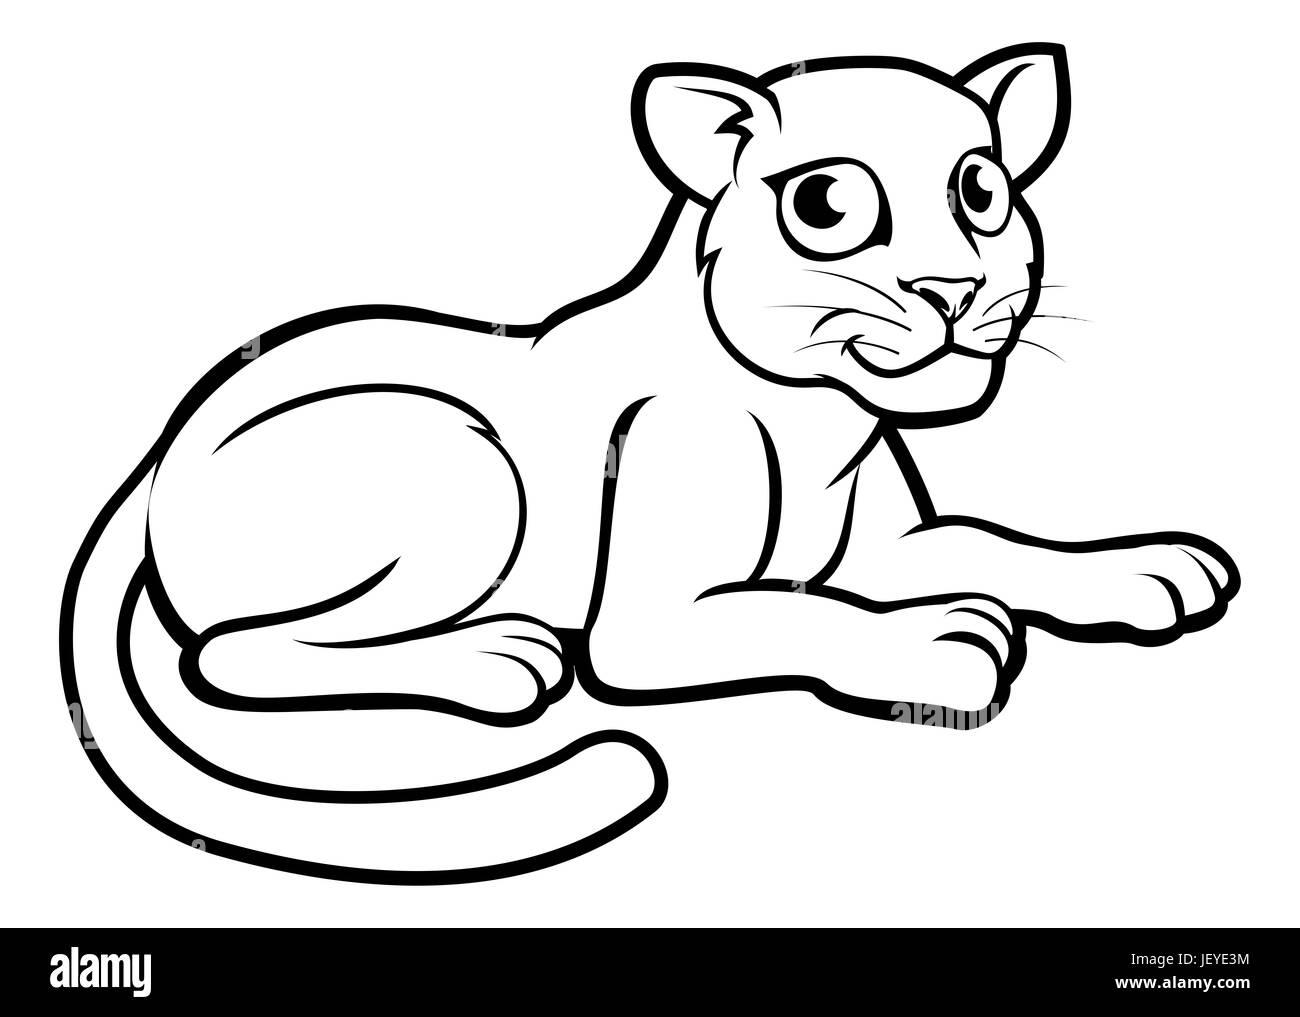 Un leopardo, el jaguar o pantera esbozo de personaje de dibujos ...